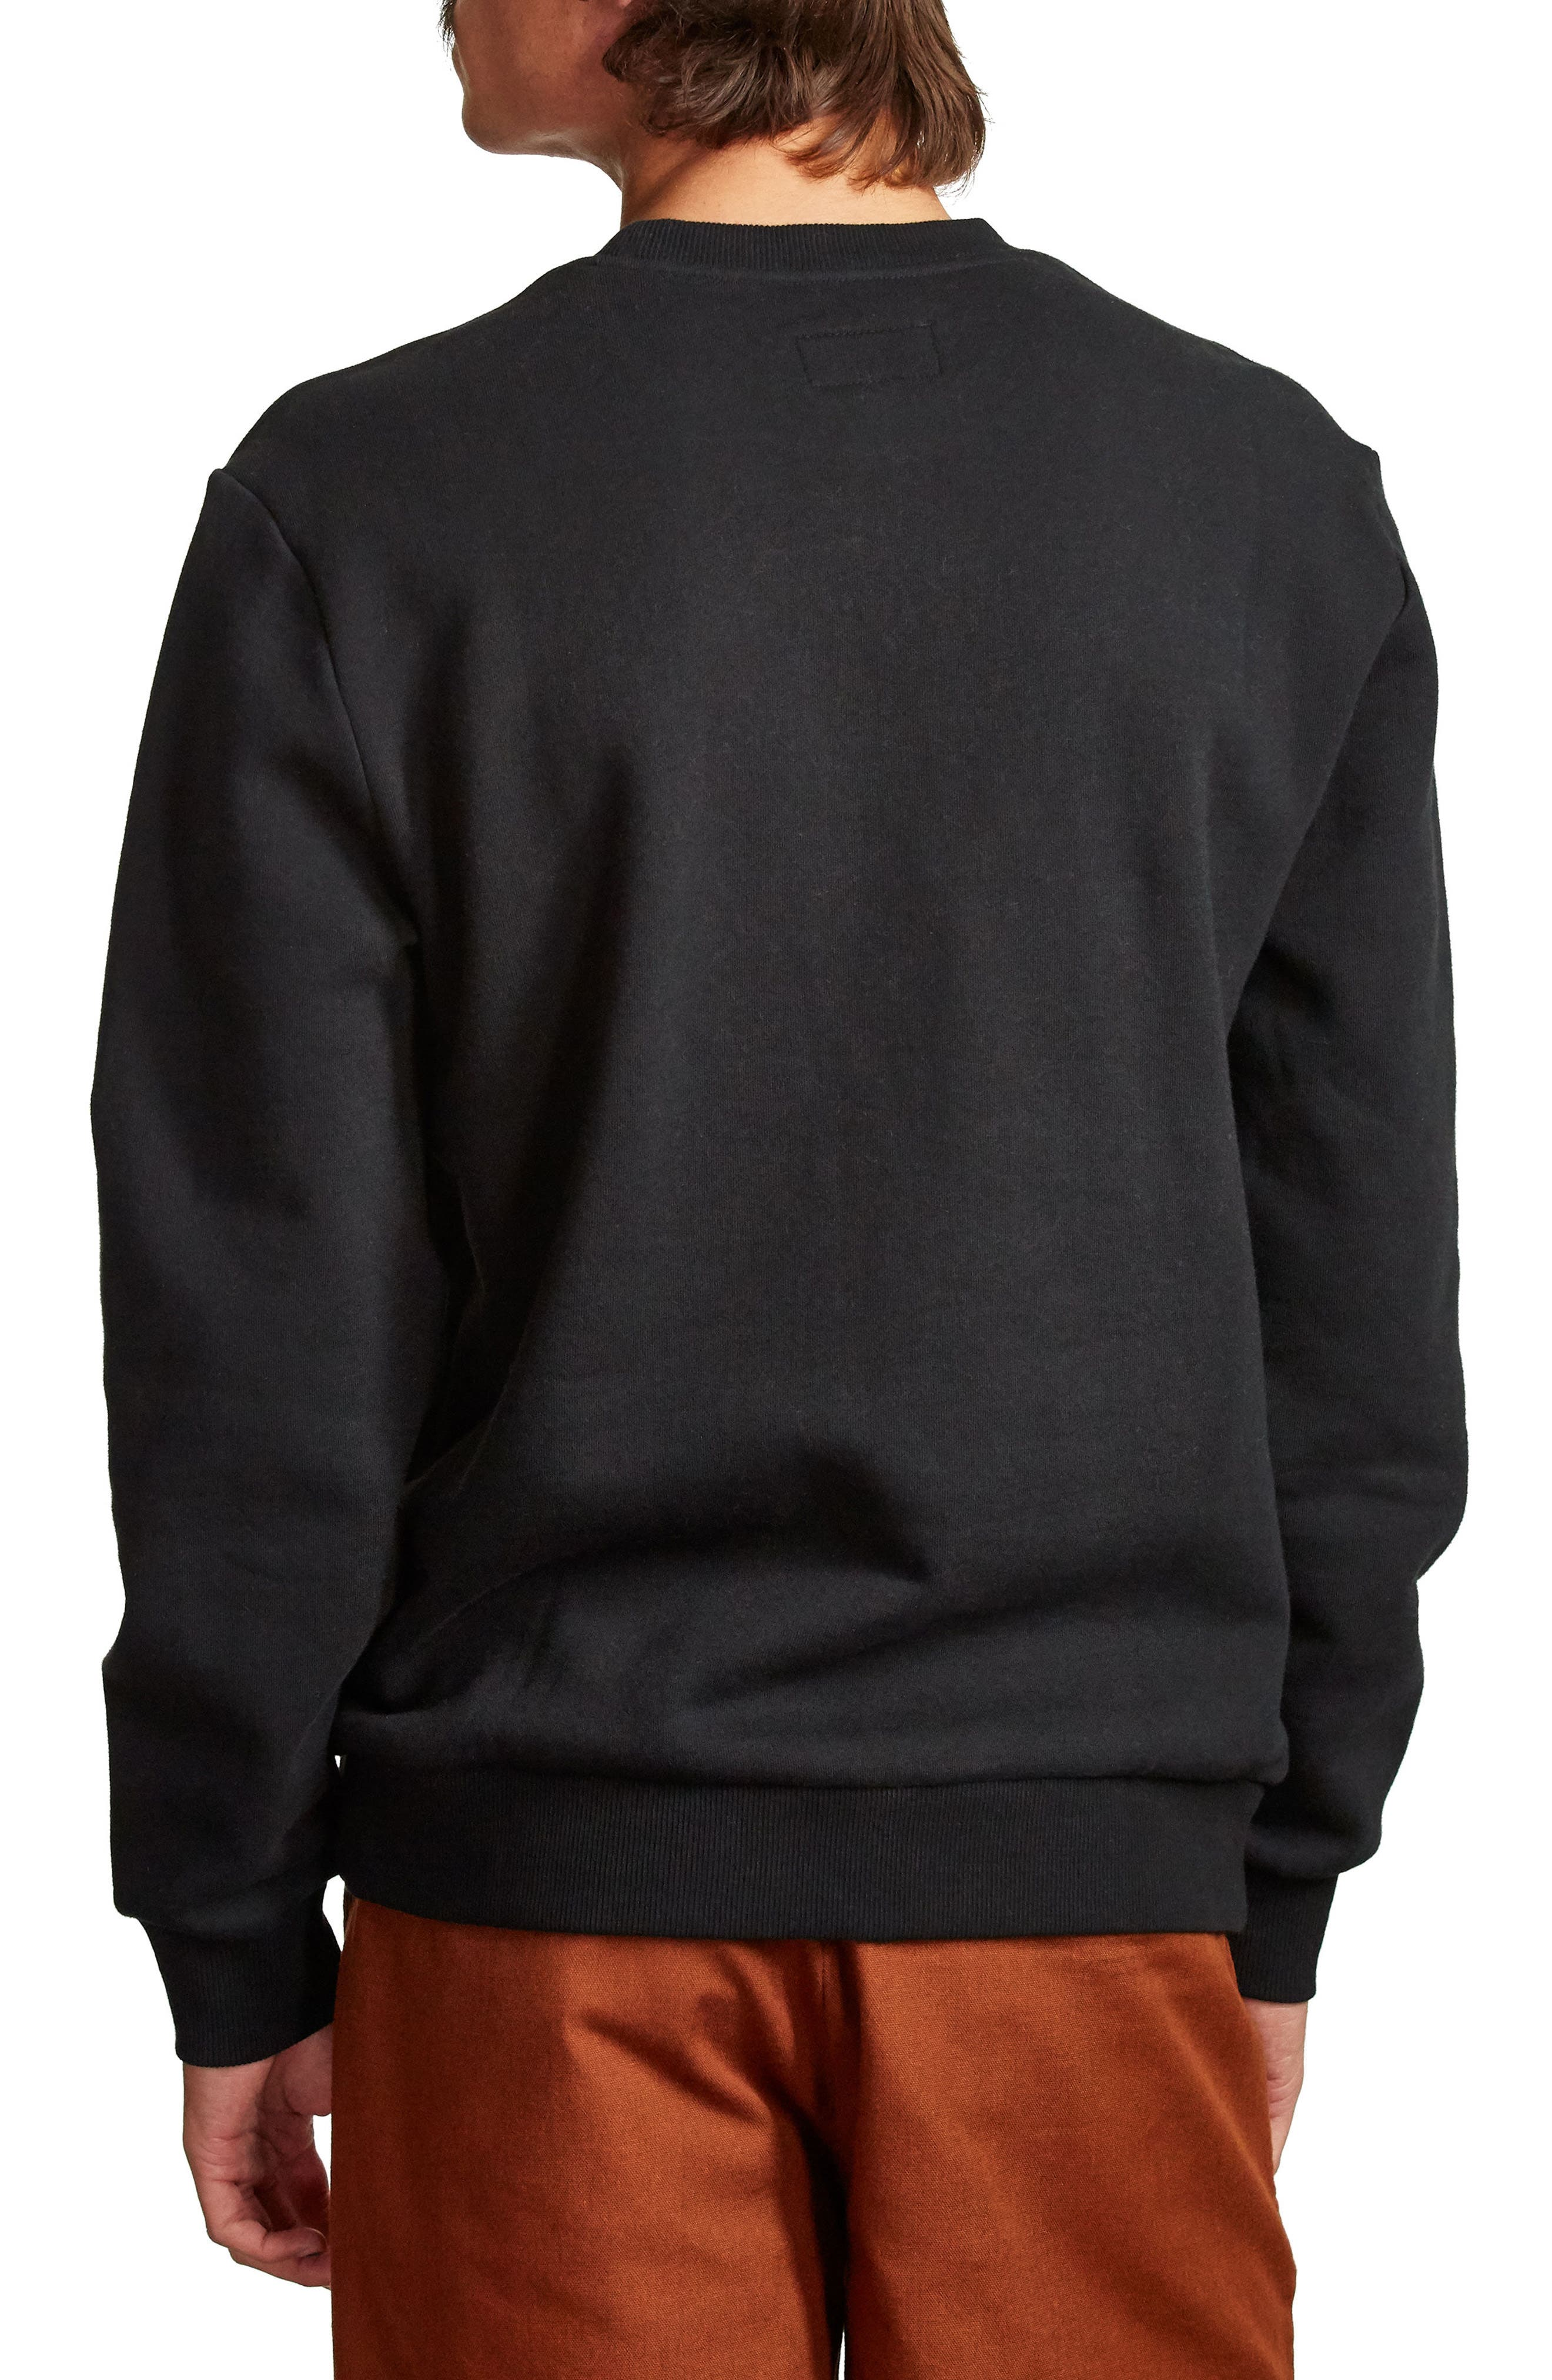 Stonewell Sweatshirt,                             Alternate thumbnail 2, color,                             Black